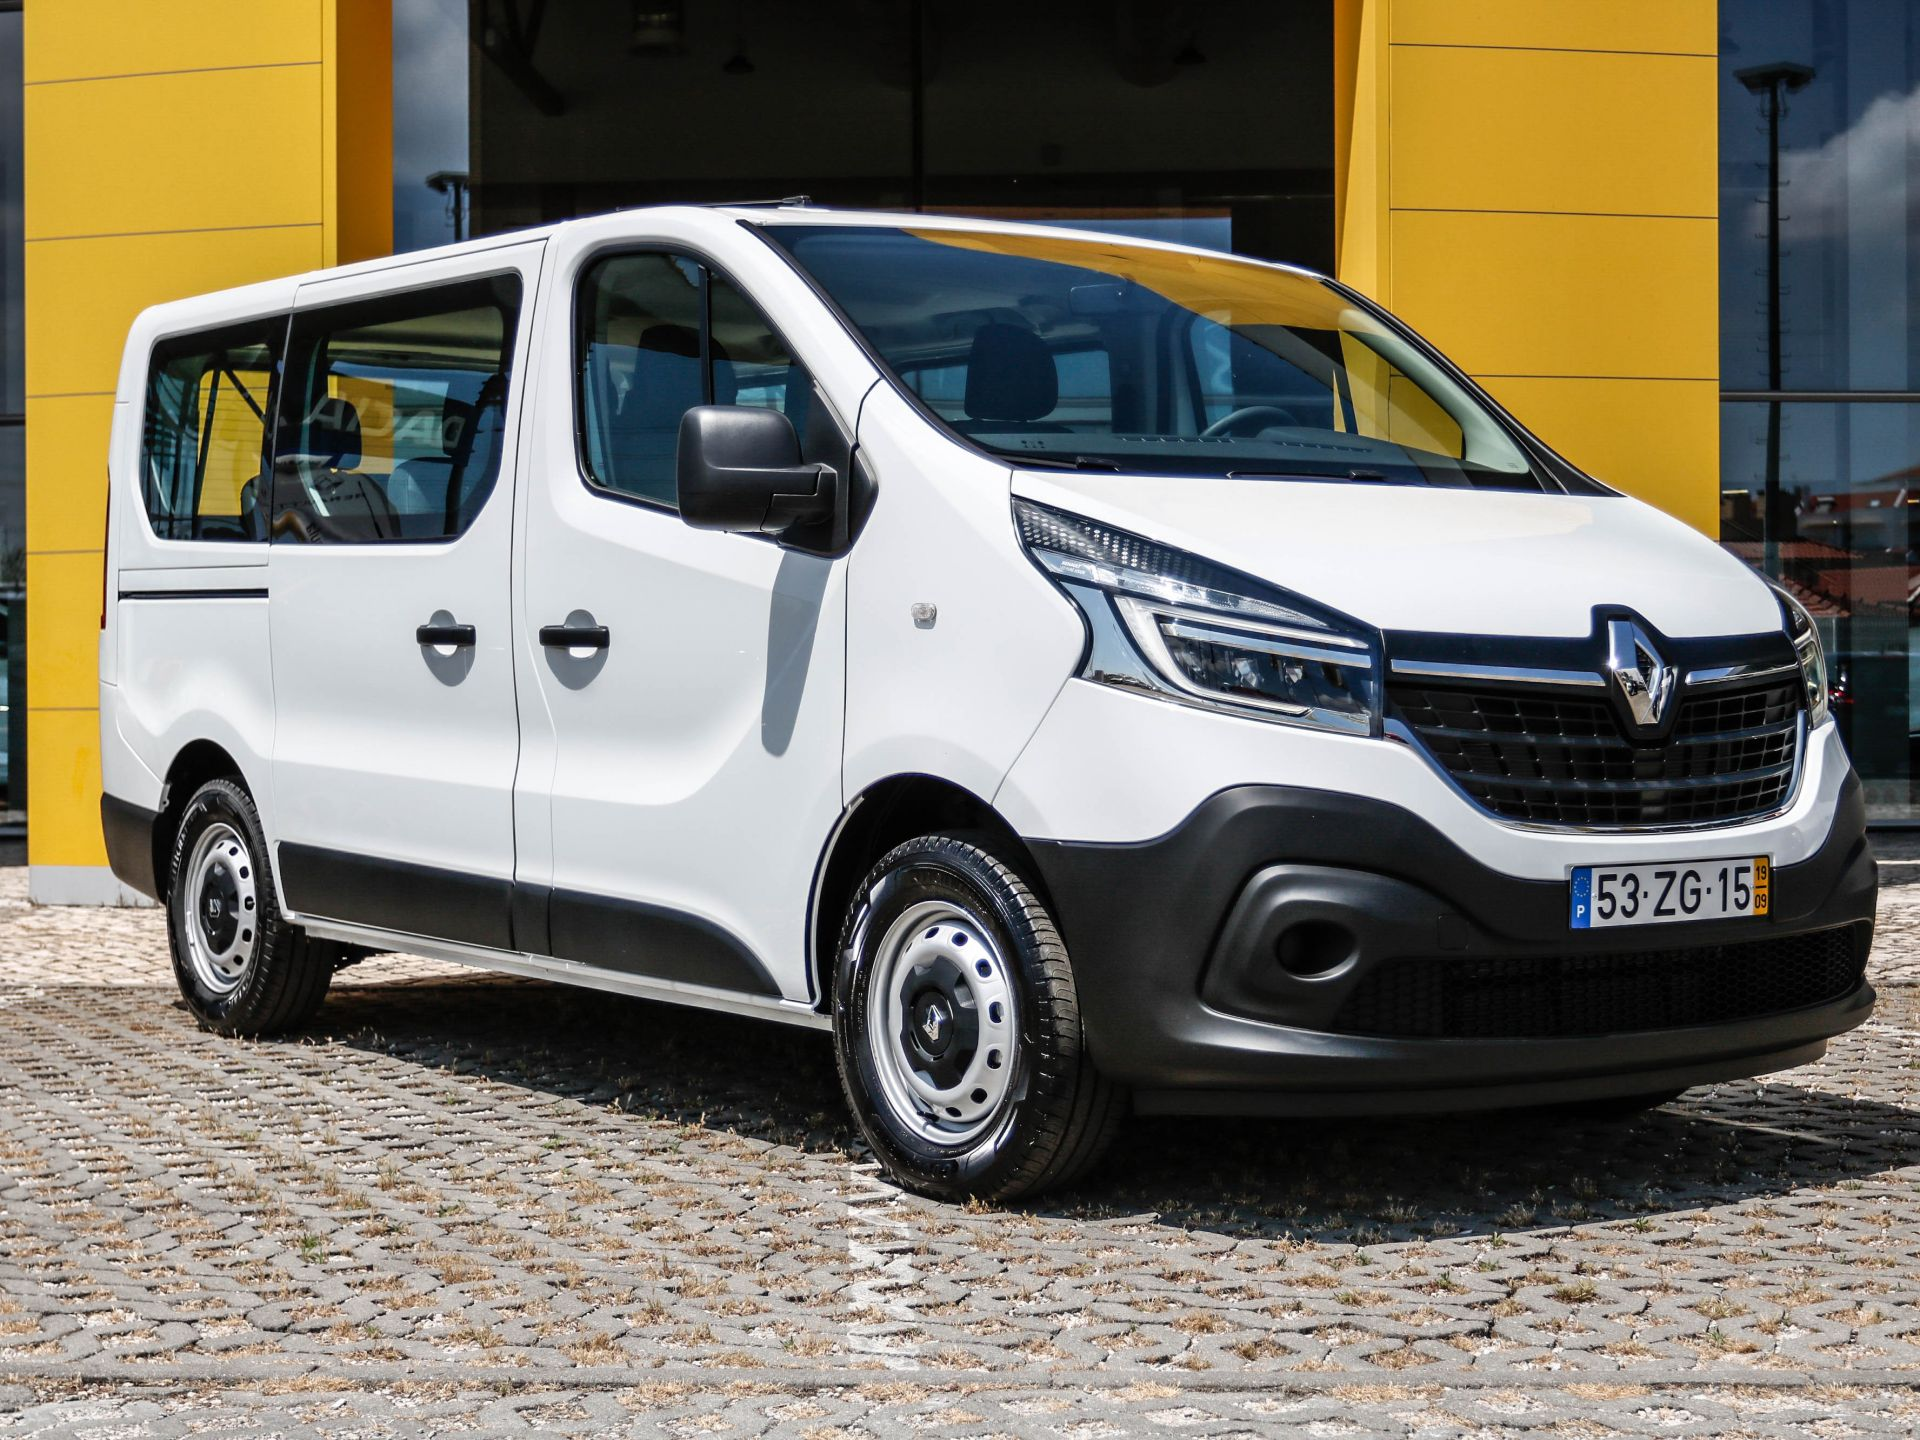 Renault Trafic Combi ZEN L1H1 1,0T 2.0 Energy DCI 120CV usada Setúbal